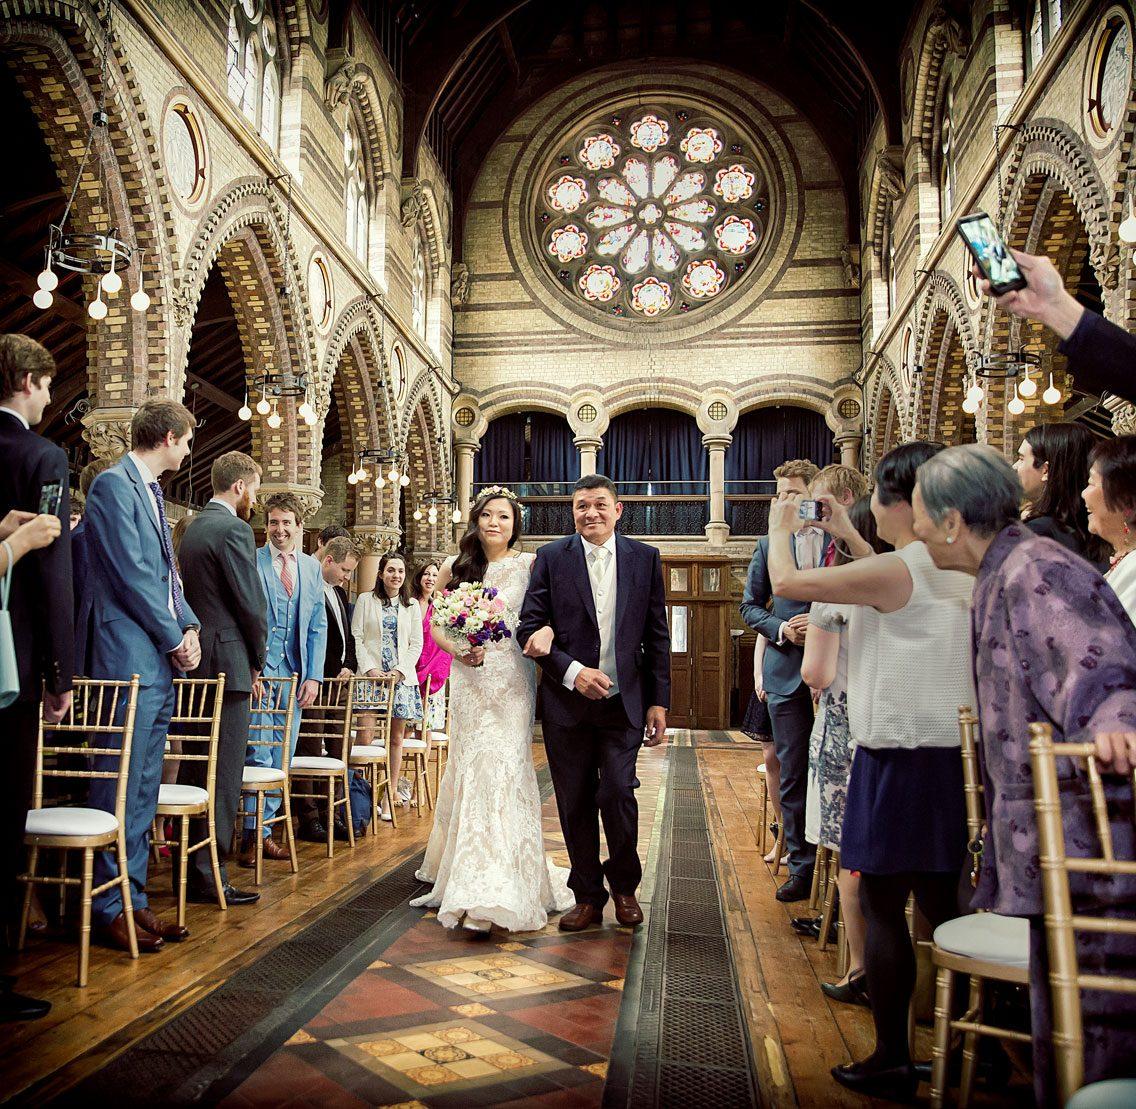 Bride walks down the aisle at Hampstead wedding